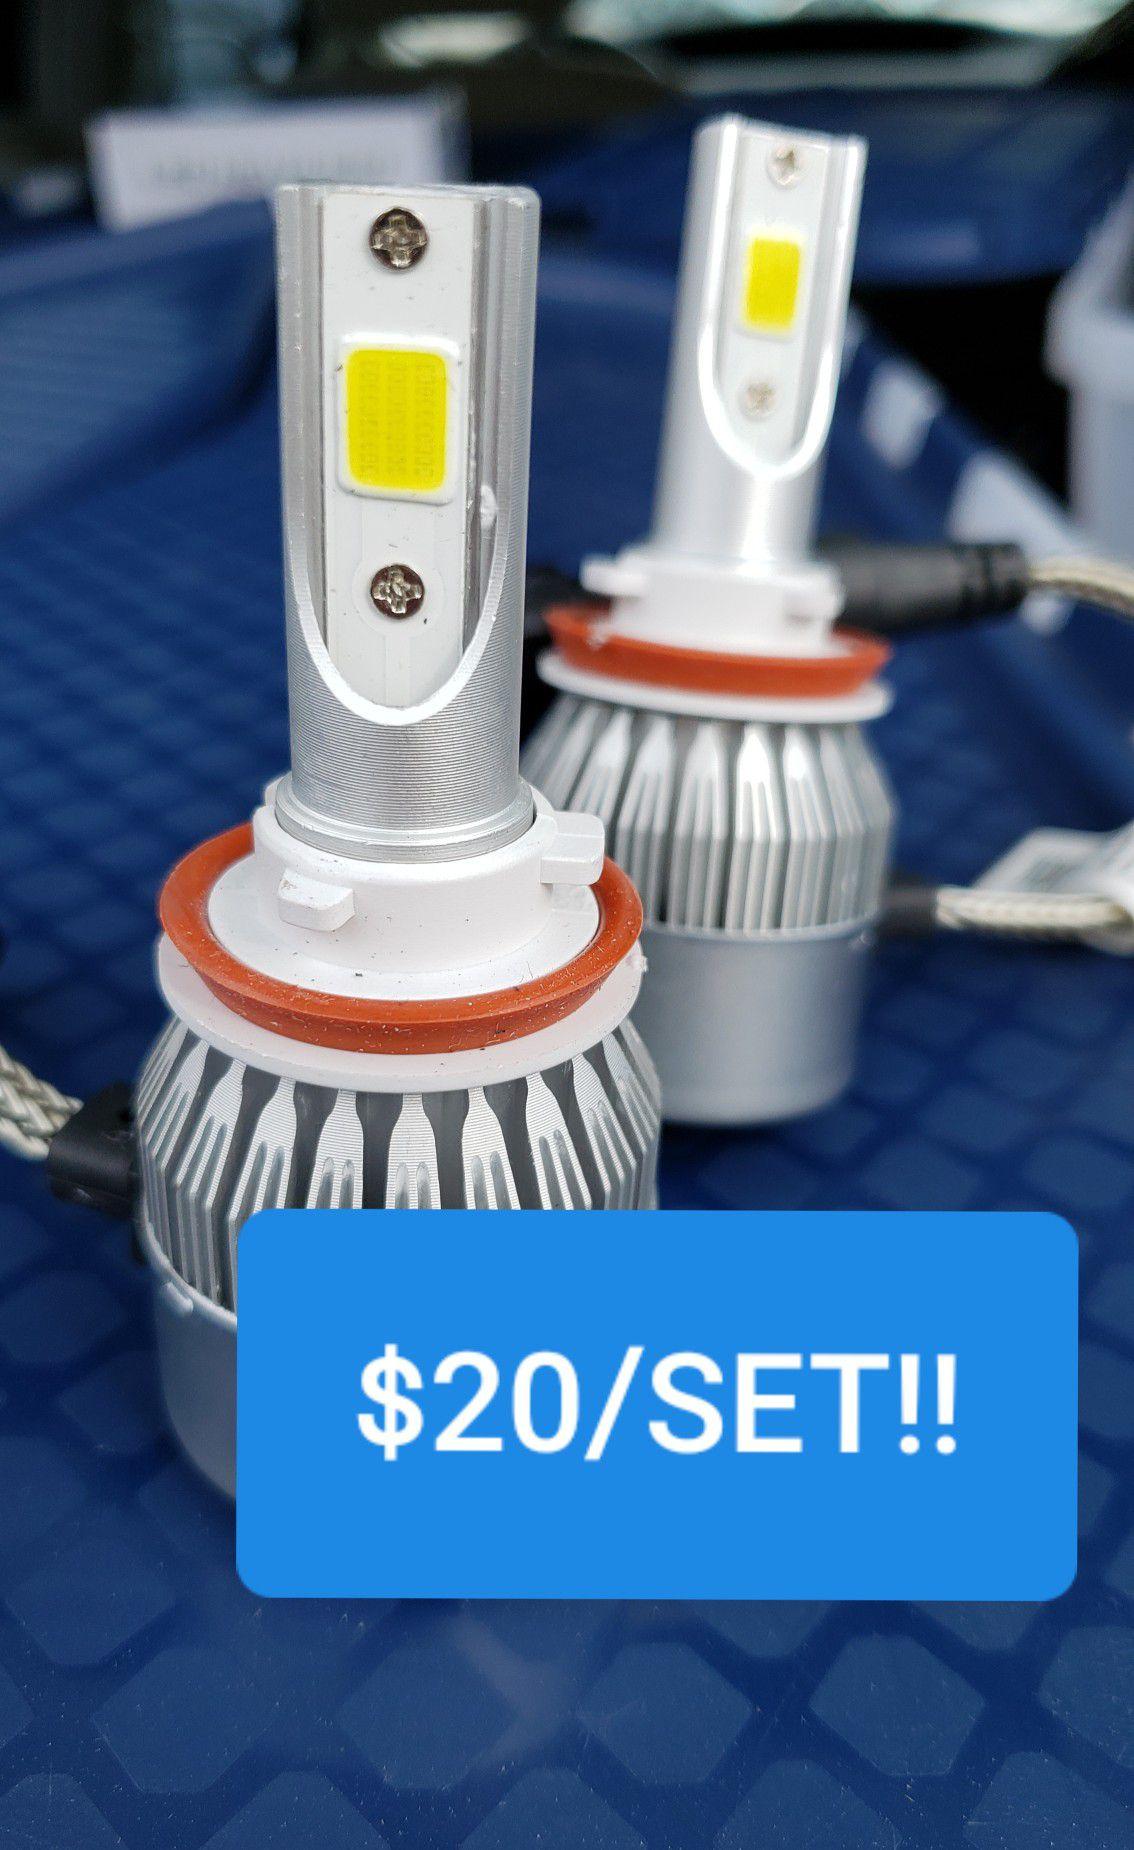 6000k LED headlights Bulbs Upgrade $20 All Cars, trucks and suv